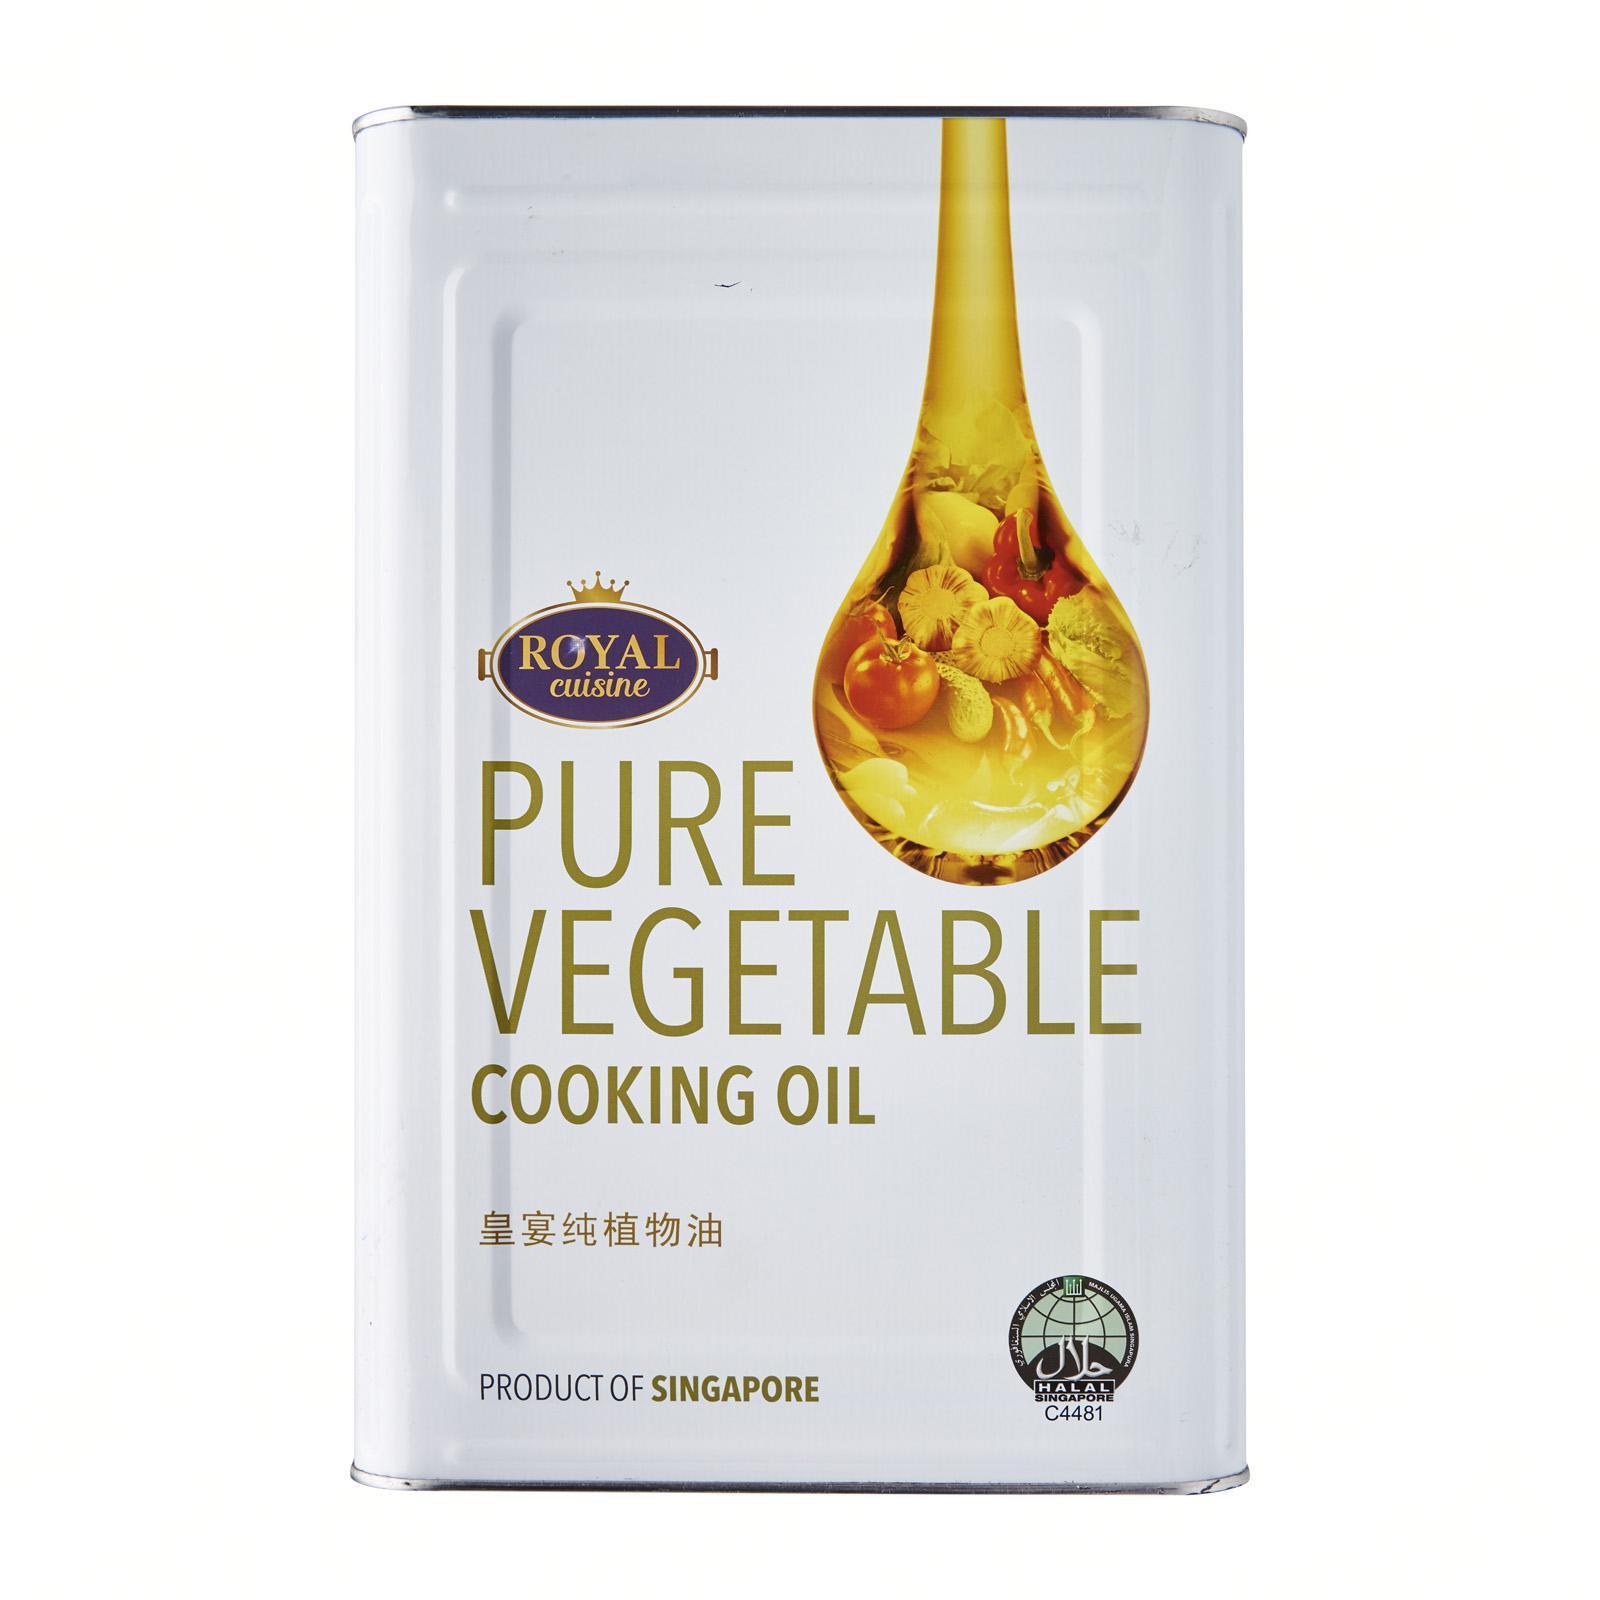 Royal Cuisine Pure Vegetable Oil By Redmart.